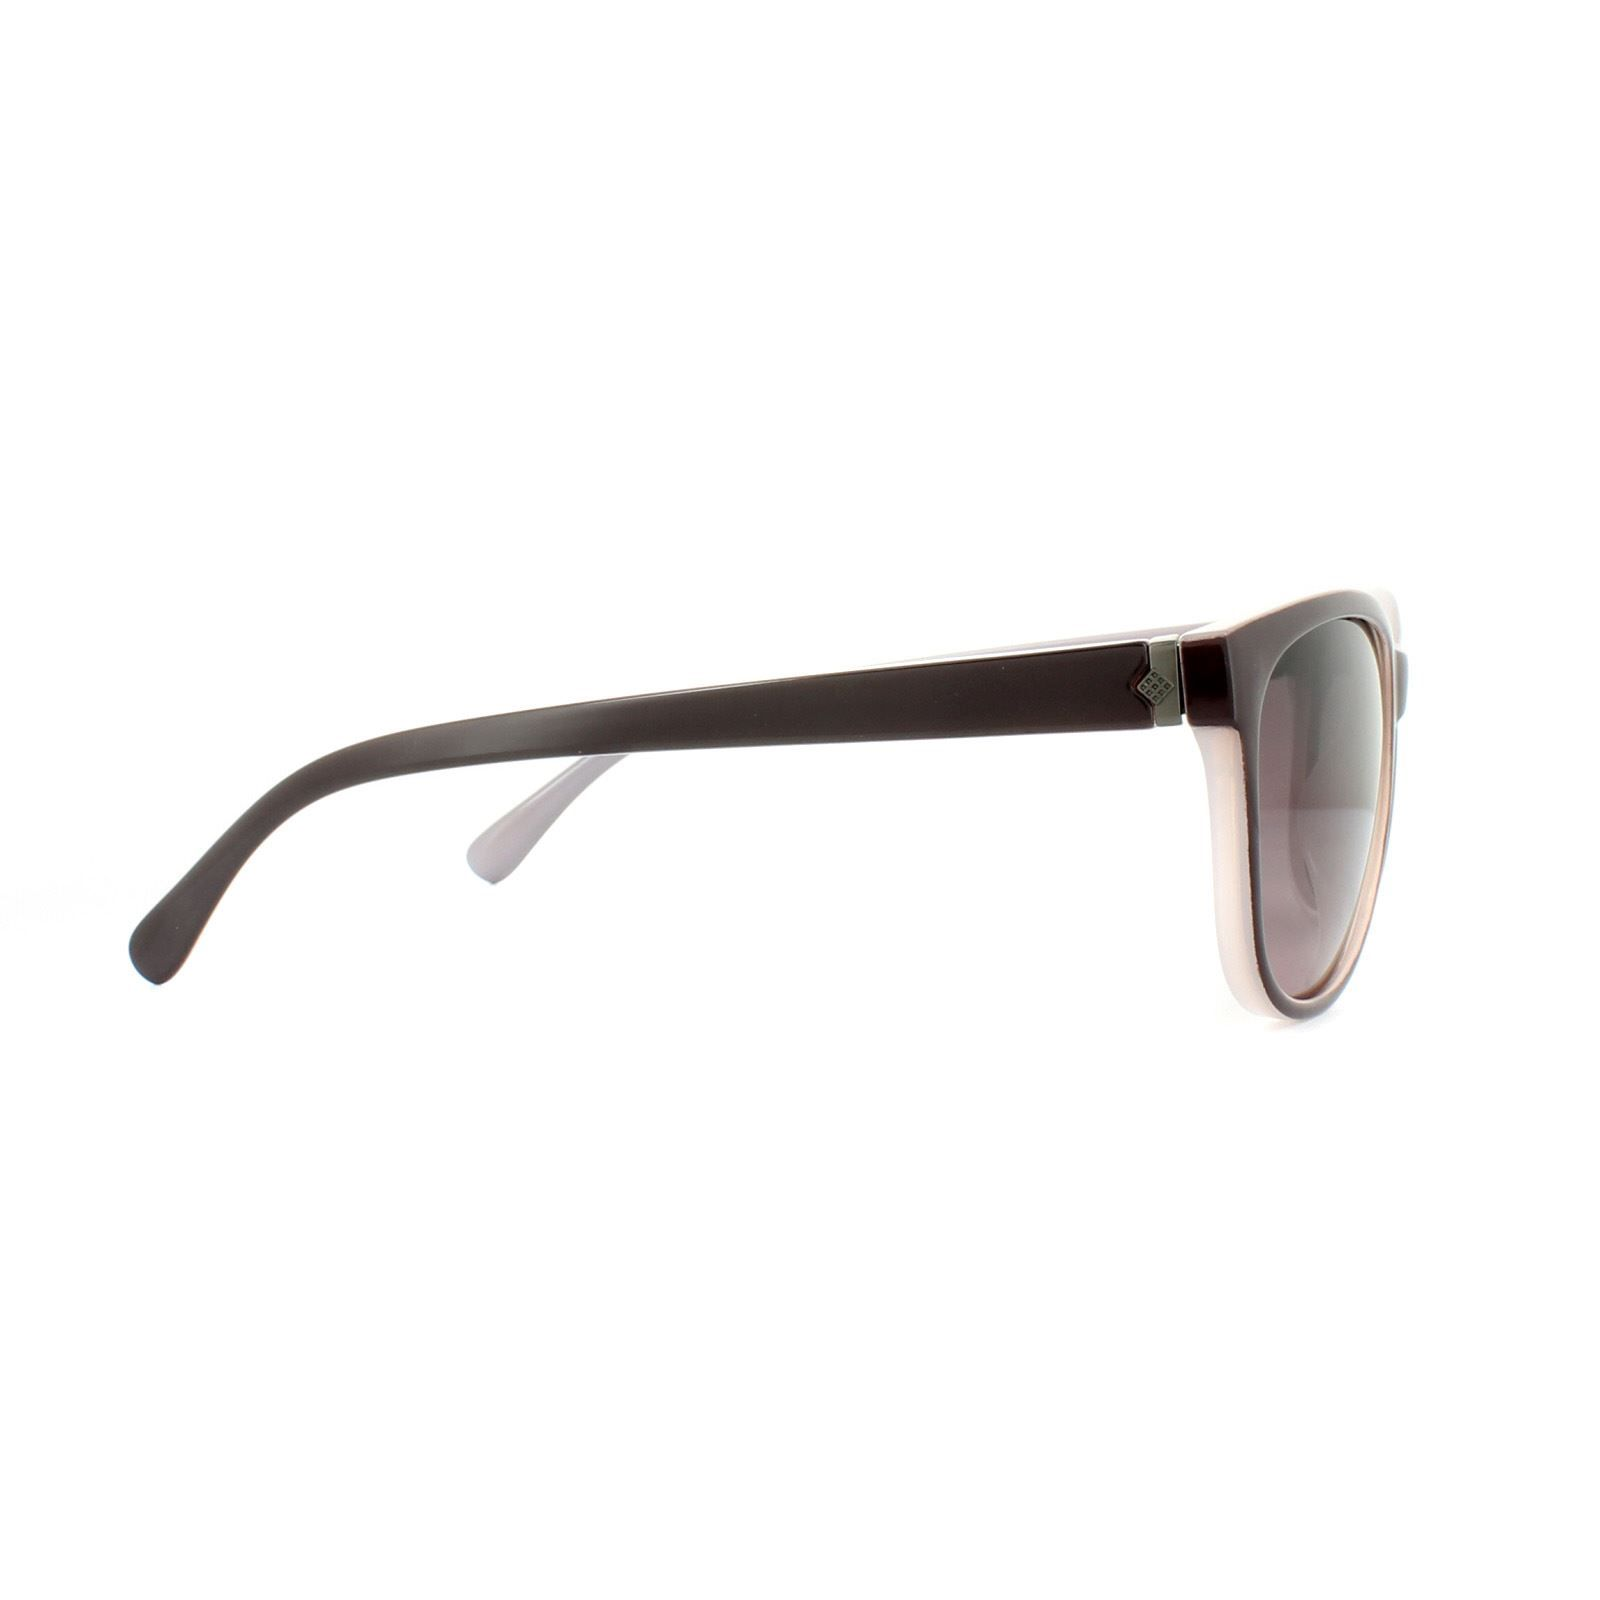 Polaroid Sunglasses P8339 C6T JR Purple Burgundy Gradient Polarized